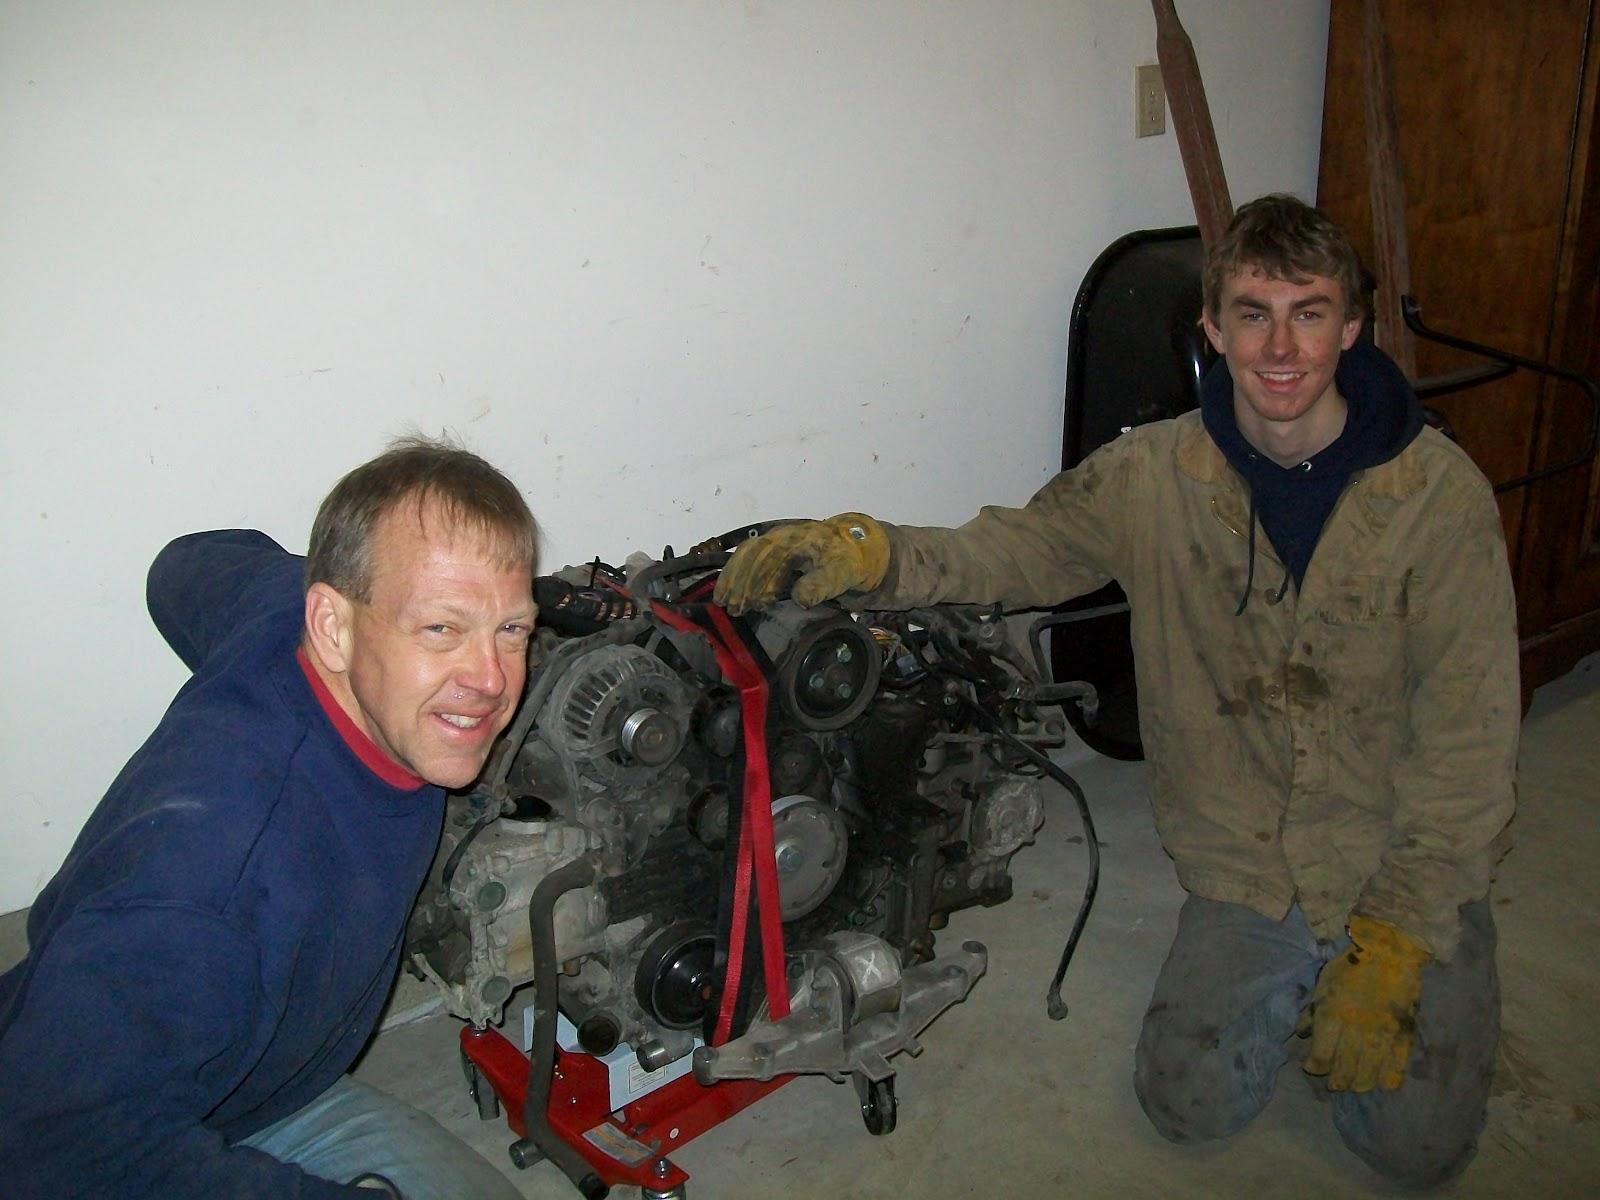 Electric Boxster Conversion